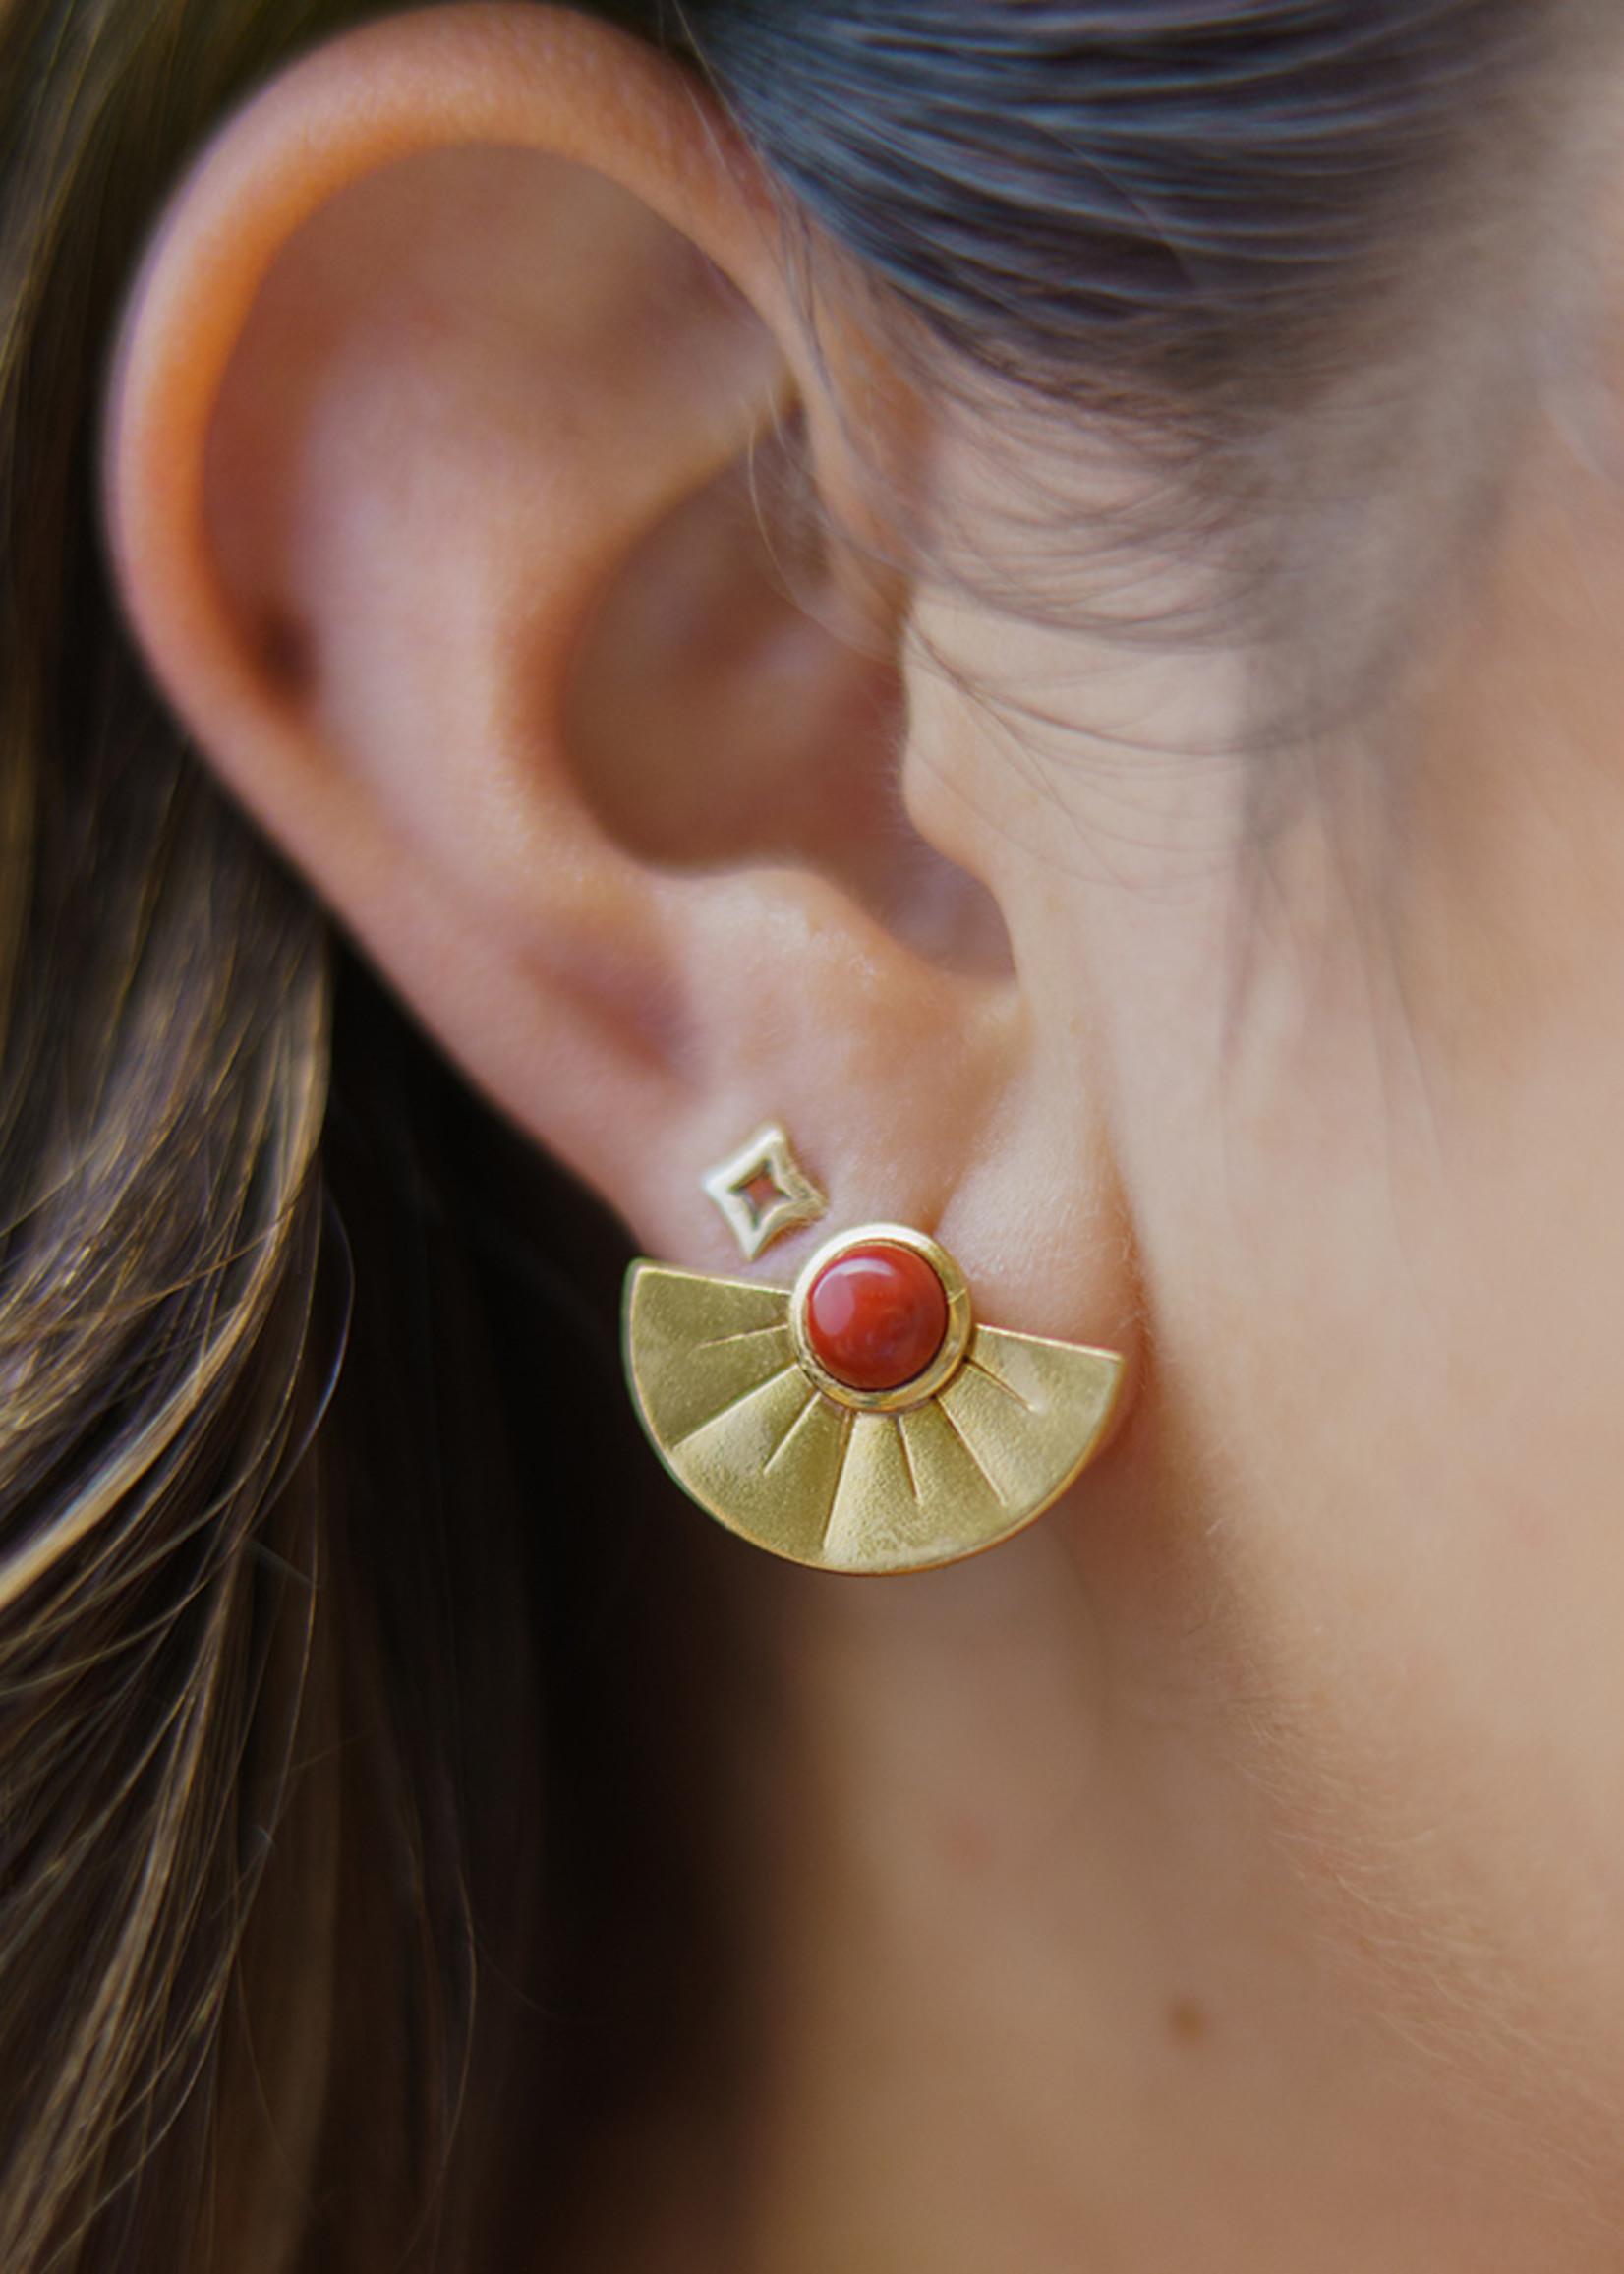 Purpose Jewelry Oasis Studs Earrings